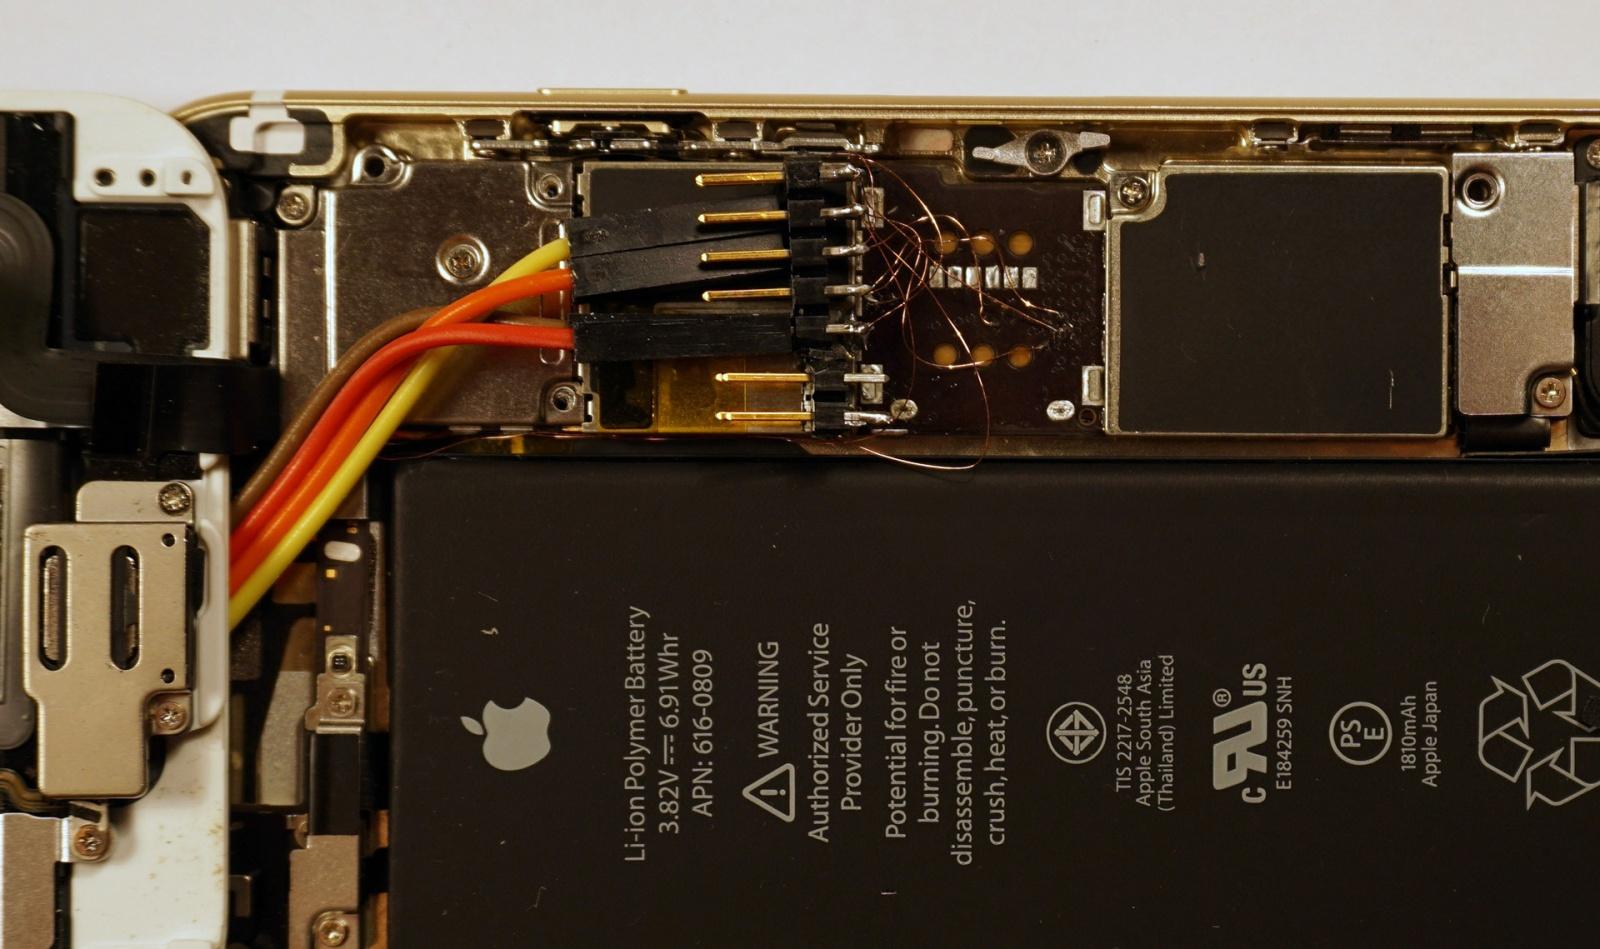 Эдвард Сноуден и хакер Банни разработали прибор для мониторинга сигналов GSM, GPS, WiFi, Bluetooth, NFC на шине телефона - 1